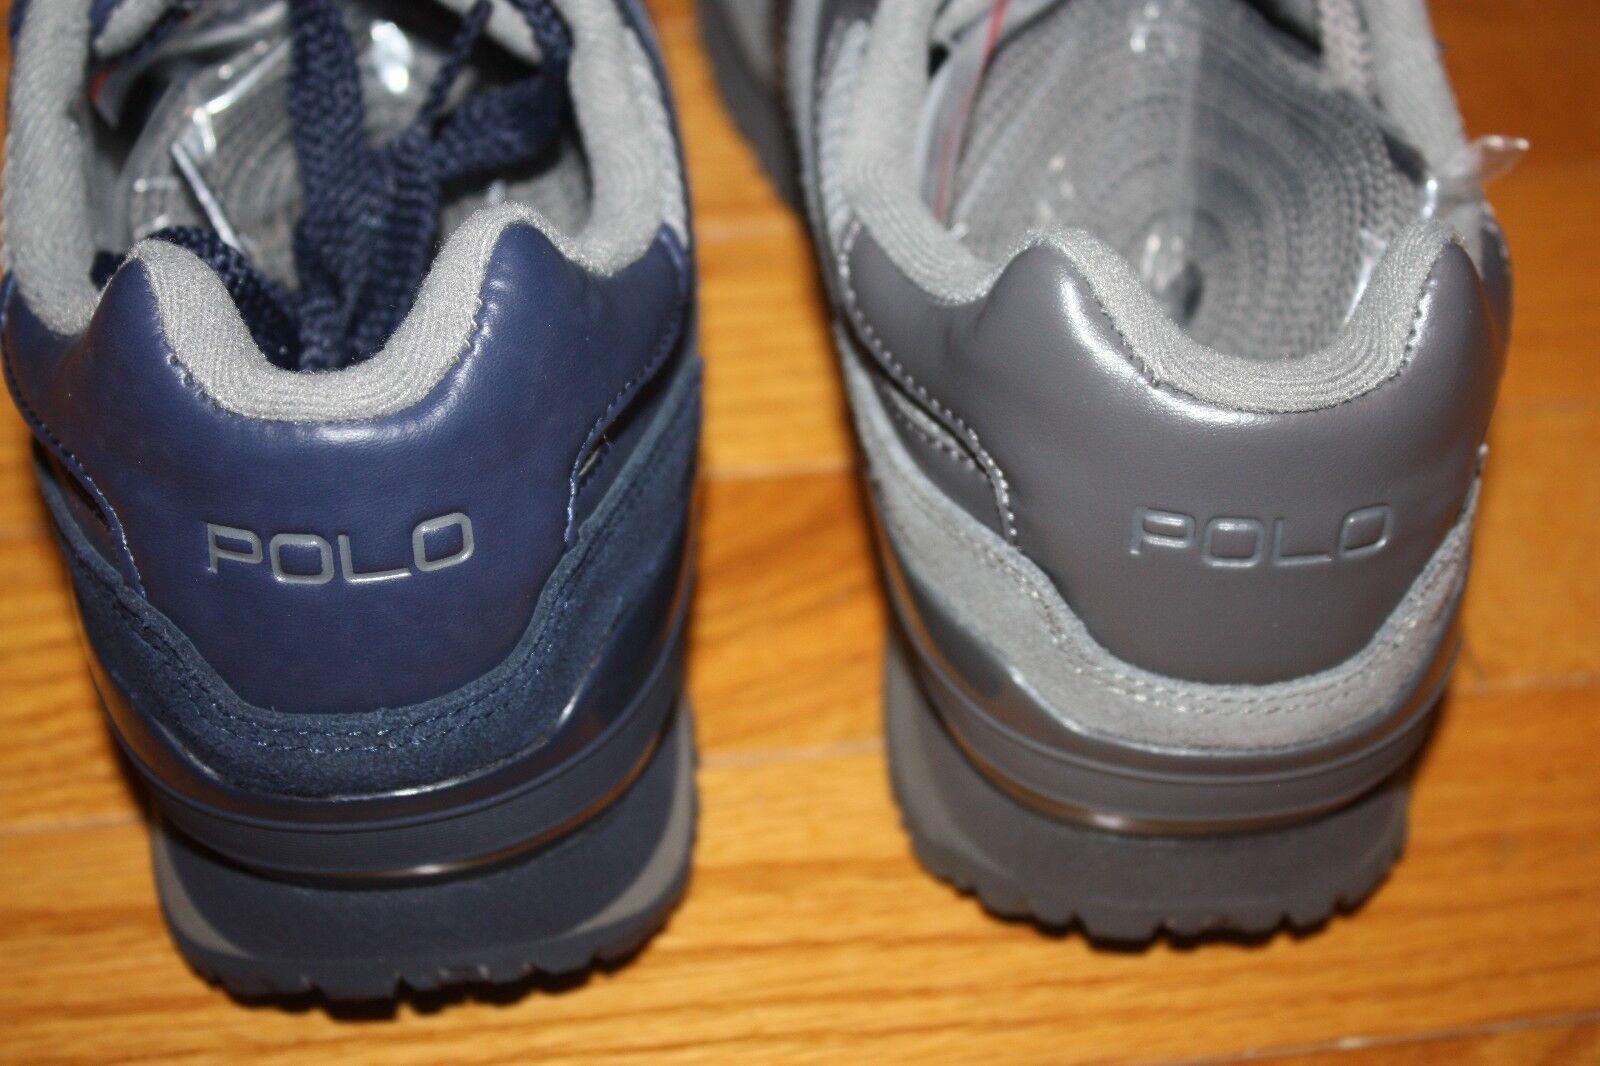 Nuevo Tech en caja Polo Sport Ralph Lauren Slaton Tech Nuevo Zapatillas Pony Gamuza envío Gratis EE. UU. c8f470